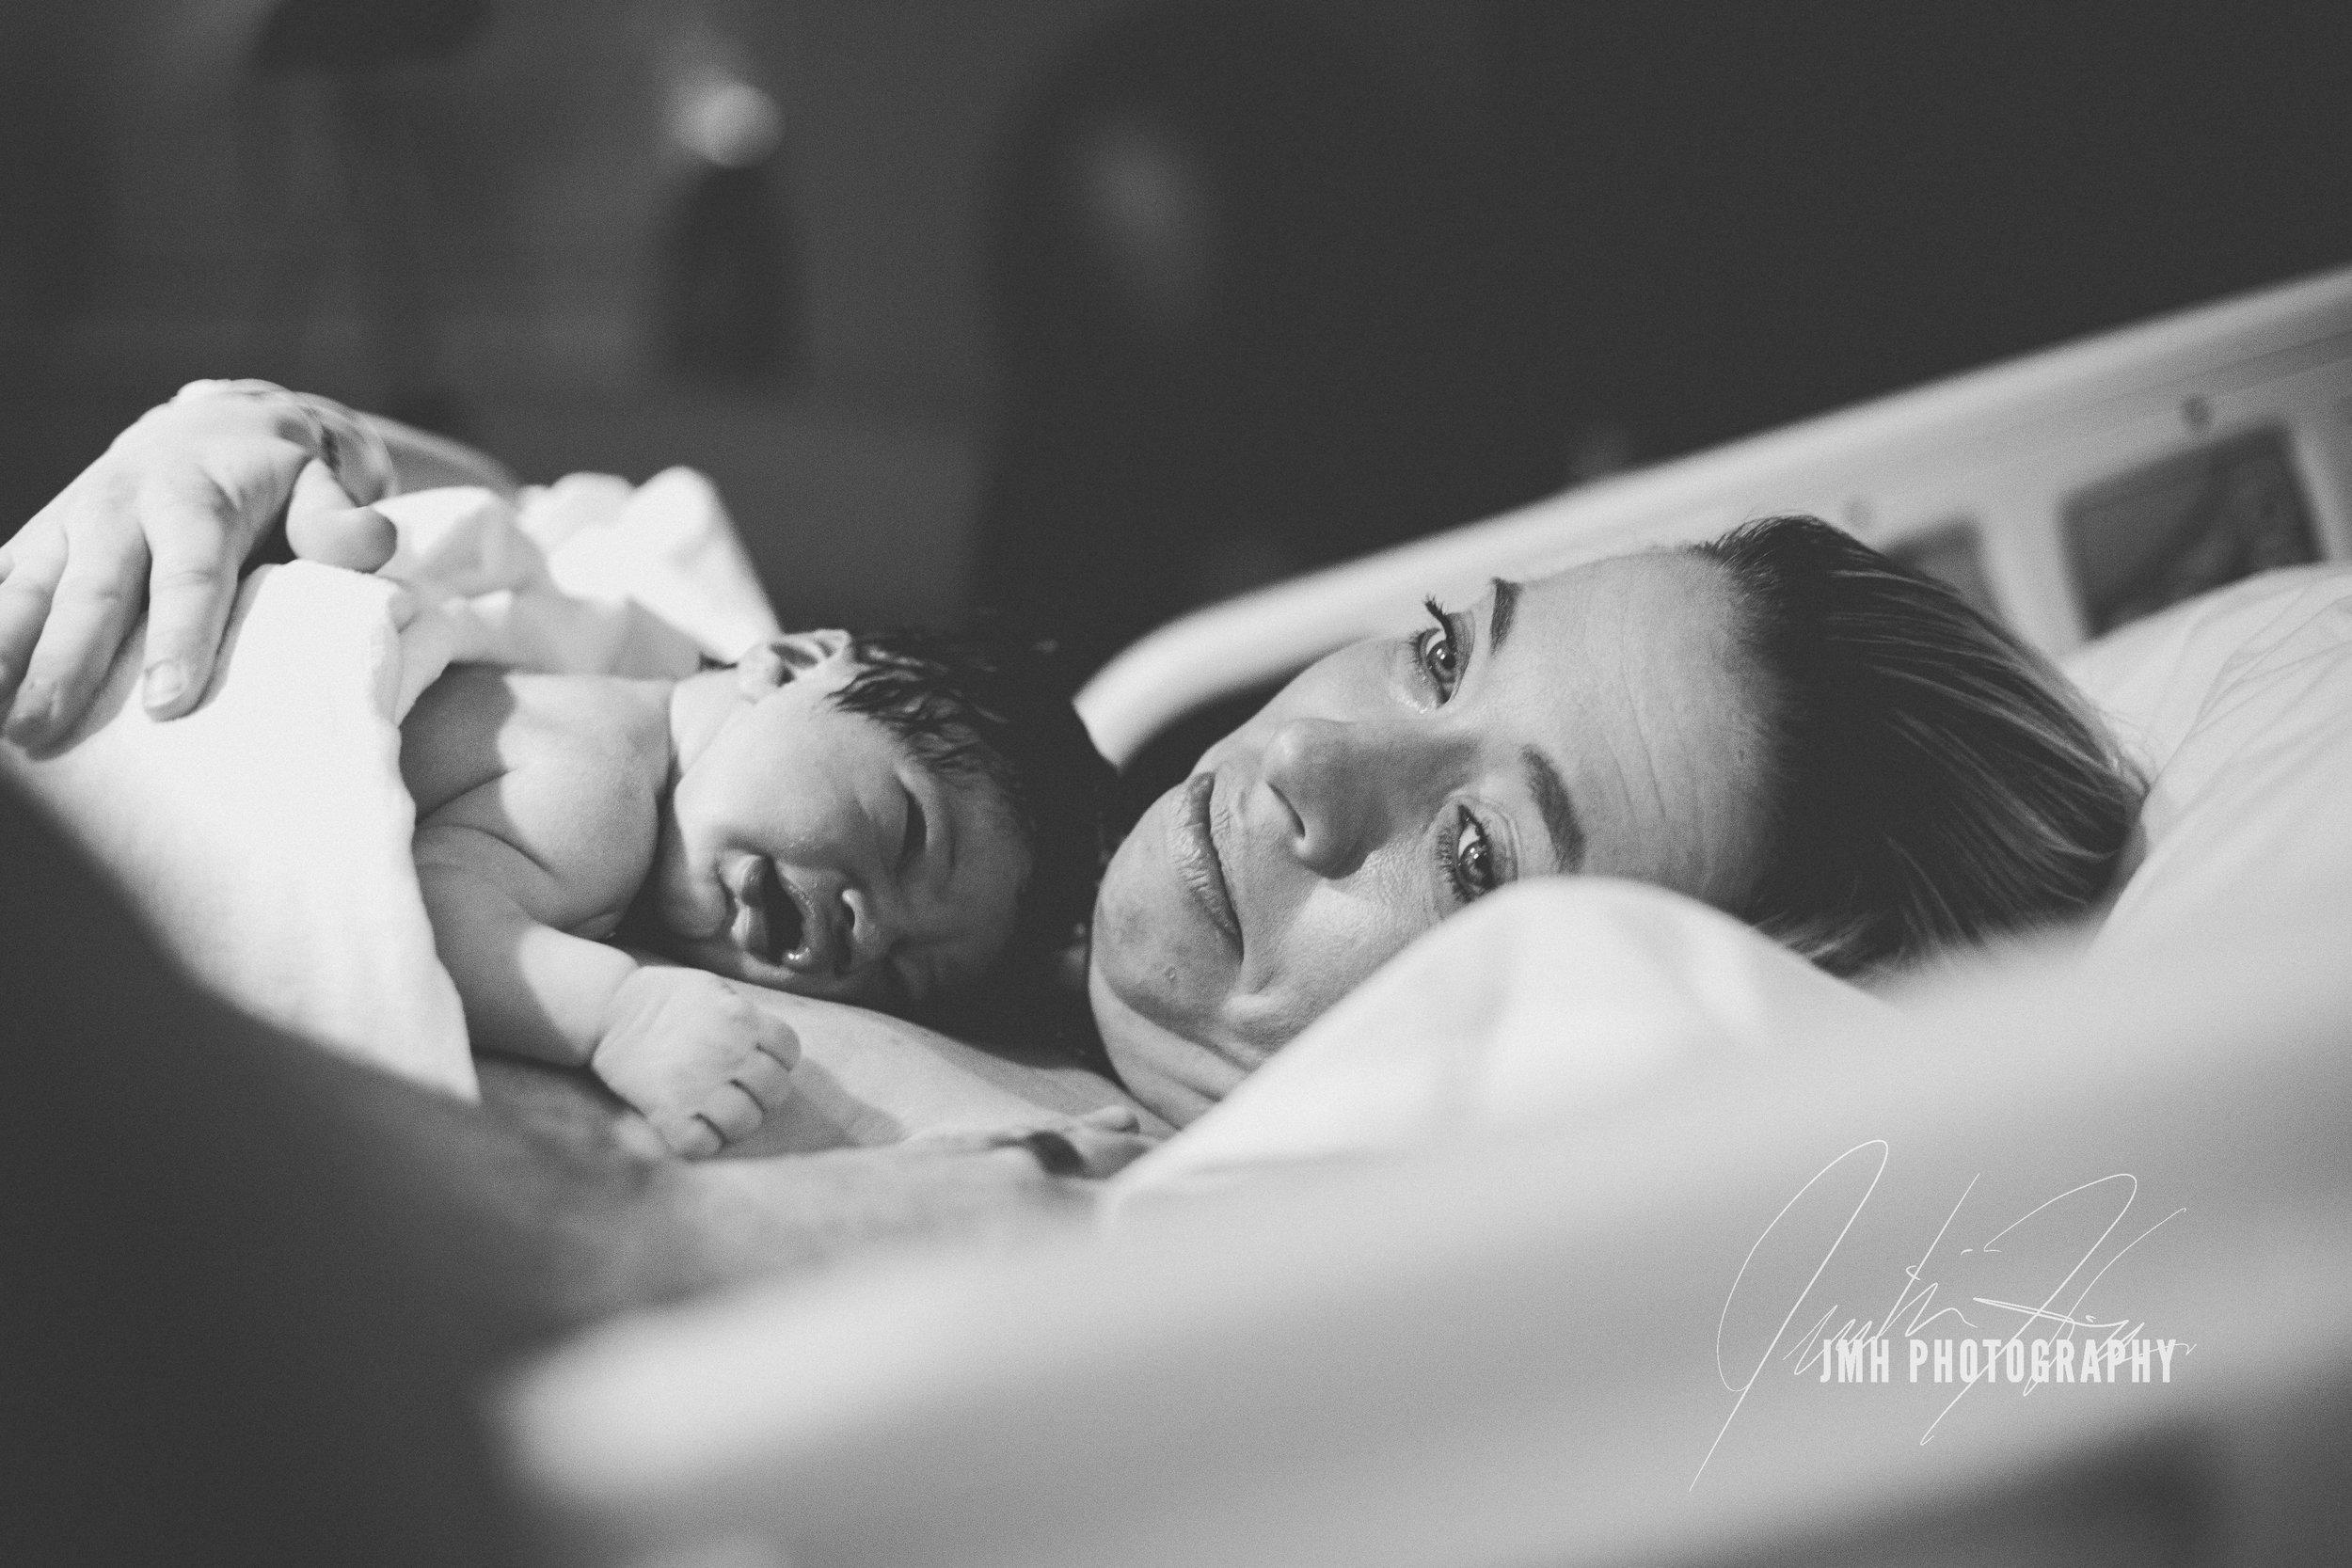 grandrapids_birth_photography-23.jpg